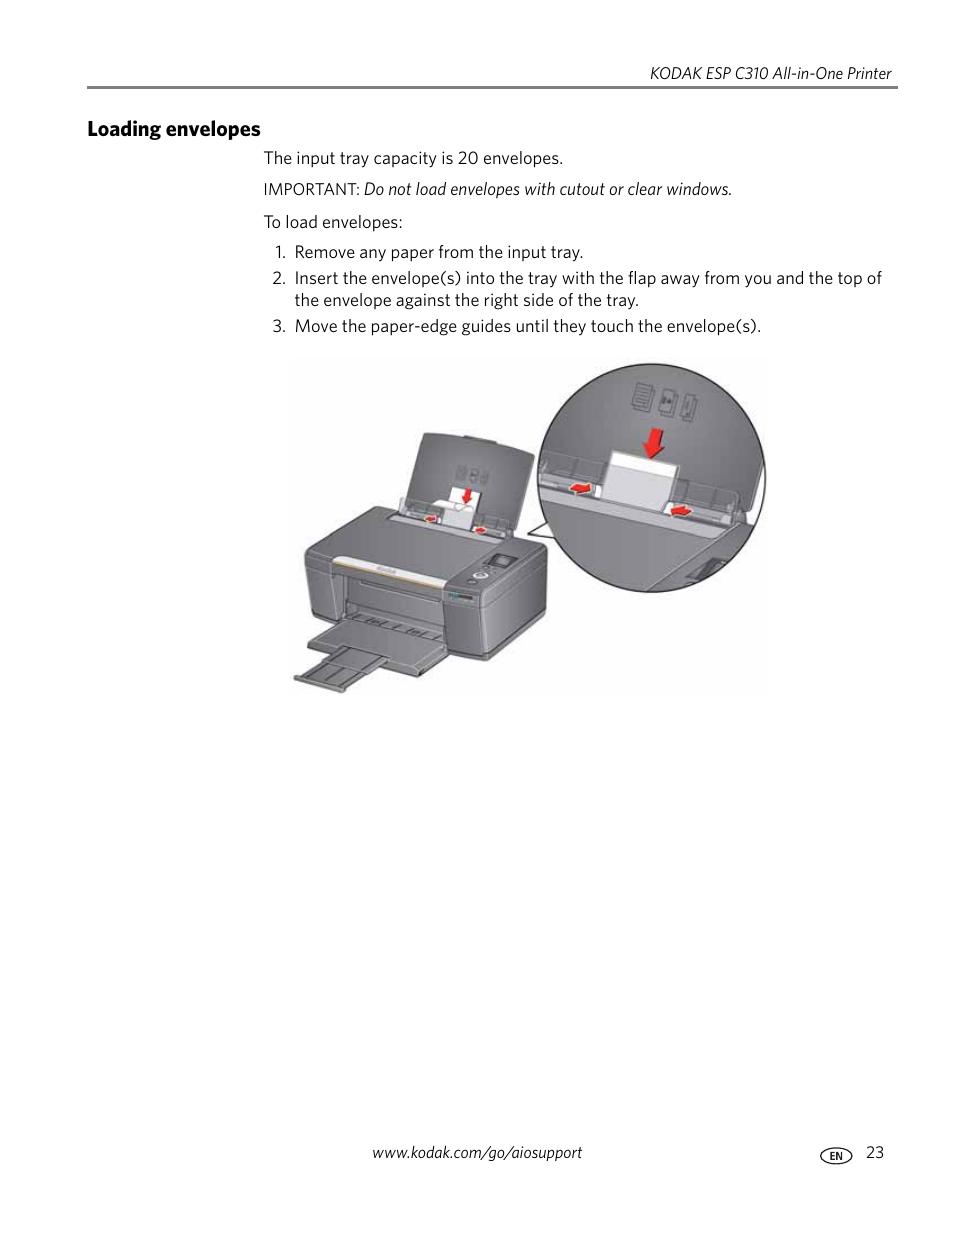 loading envelopes kodak esp c310 user manual page 29 94 rh manualsdir com